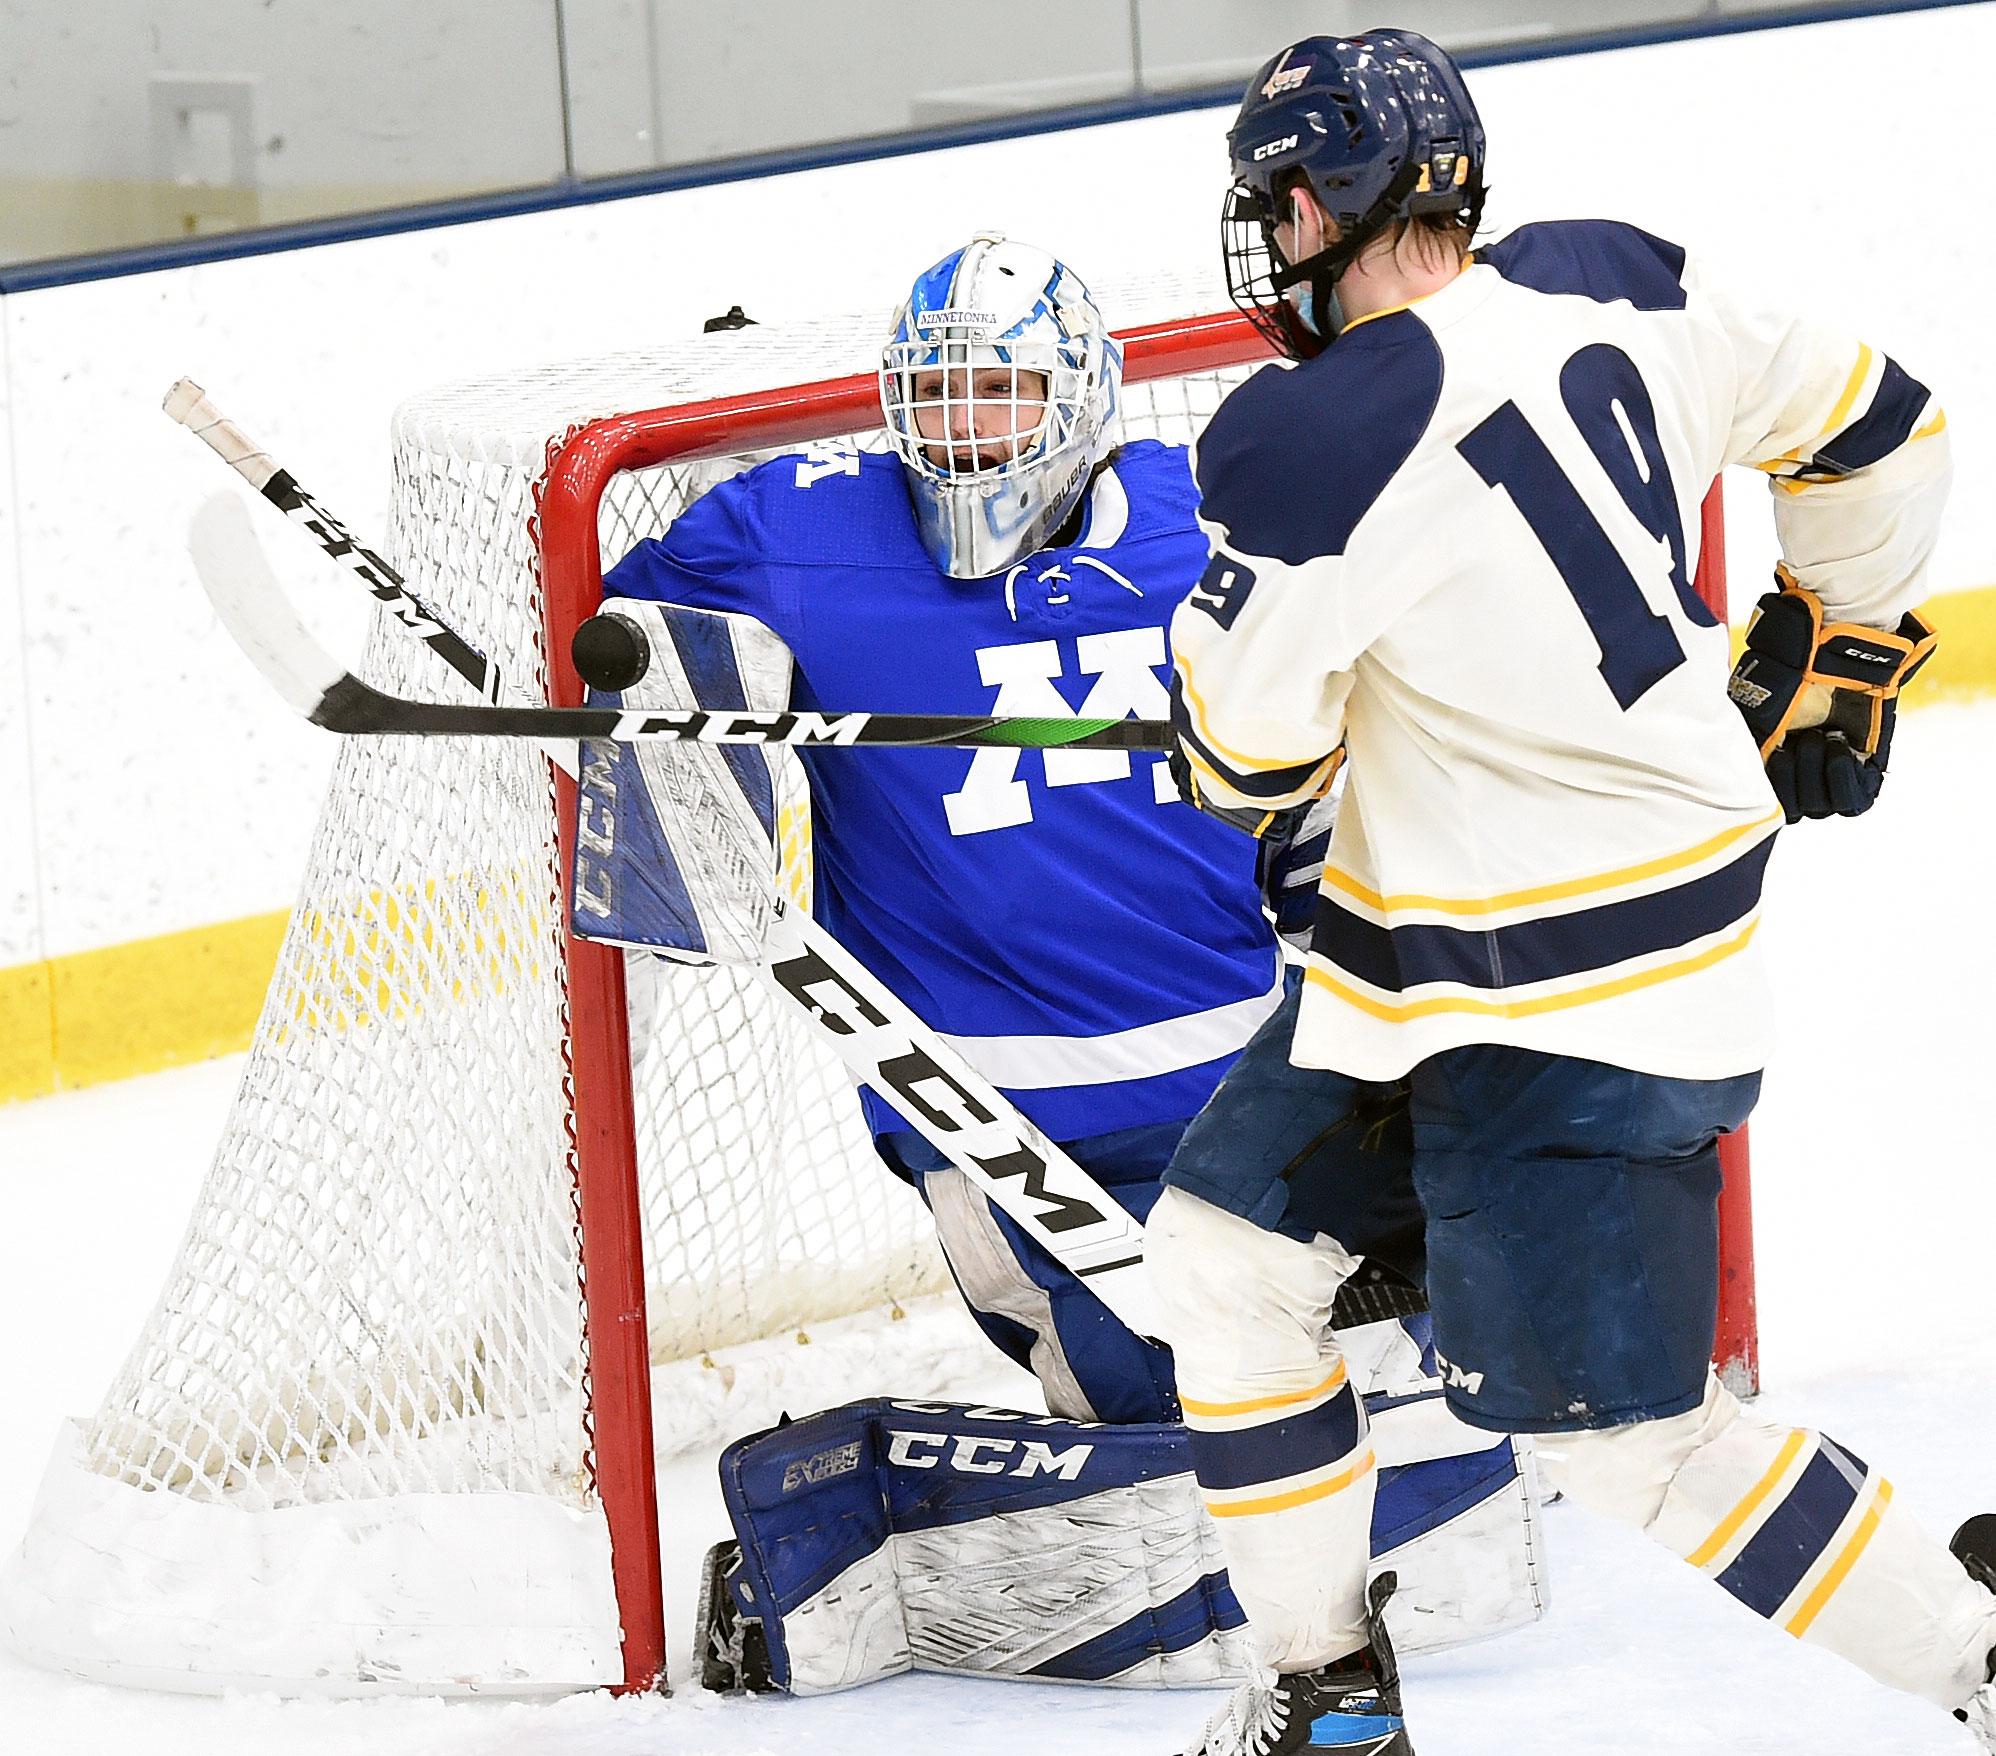 Minnetonka goaltender Kyle Briesemeister makes a second-period save in front of Prior Lake's Alex Bump. Photo by Loren Nelson, SportsEngine